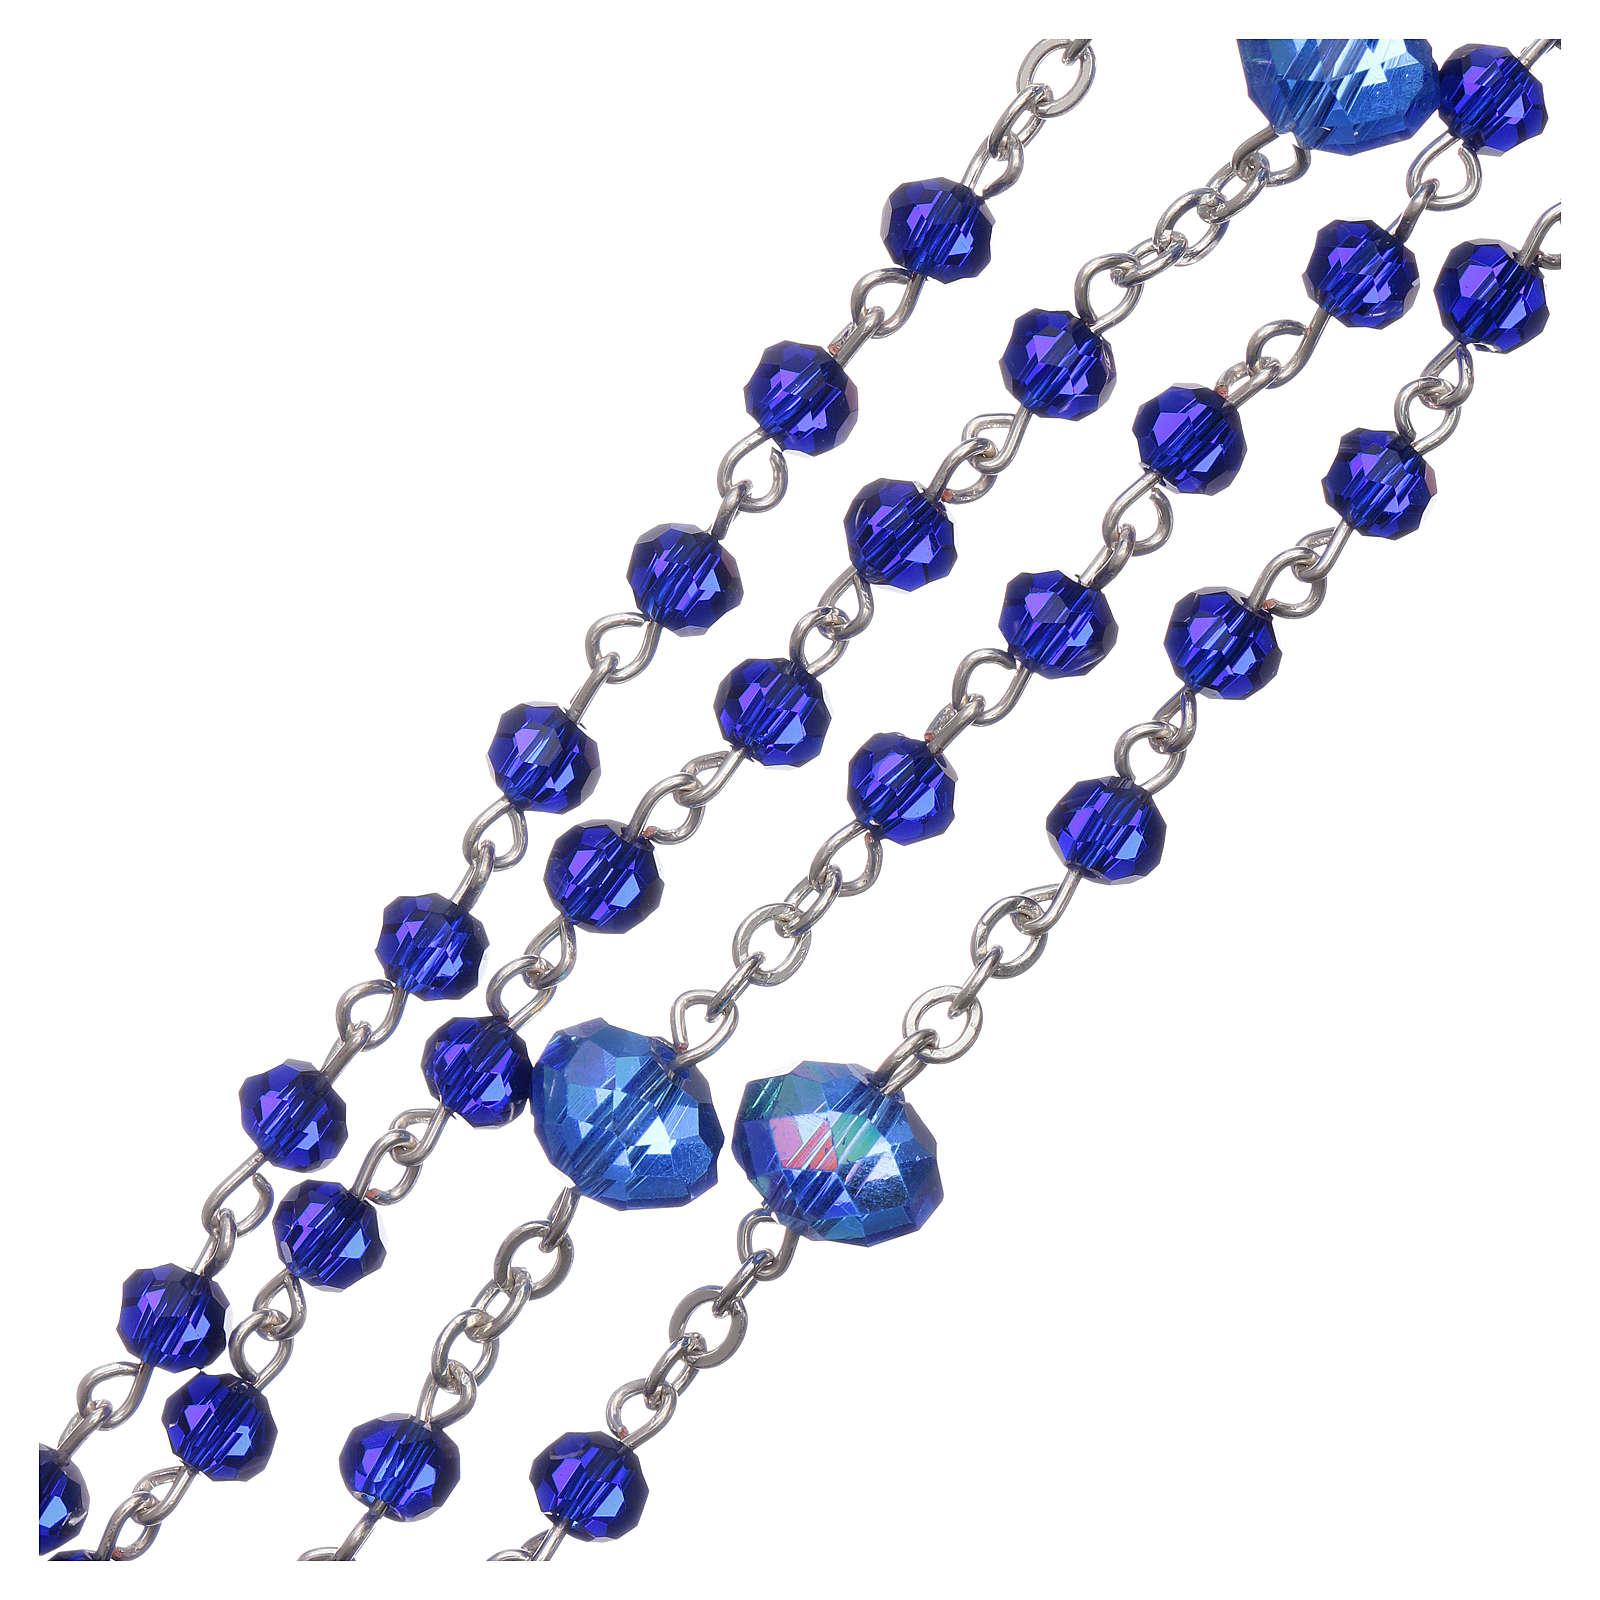 Coroncina Medjugorje cristallo blu 4 mm 4